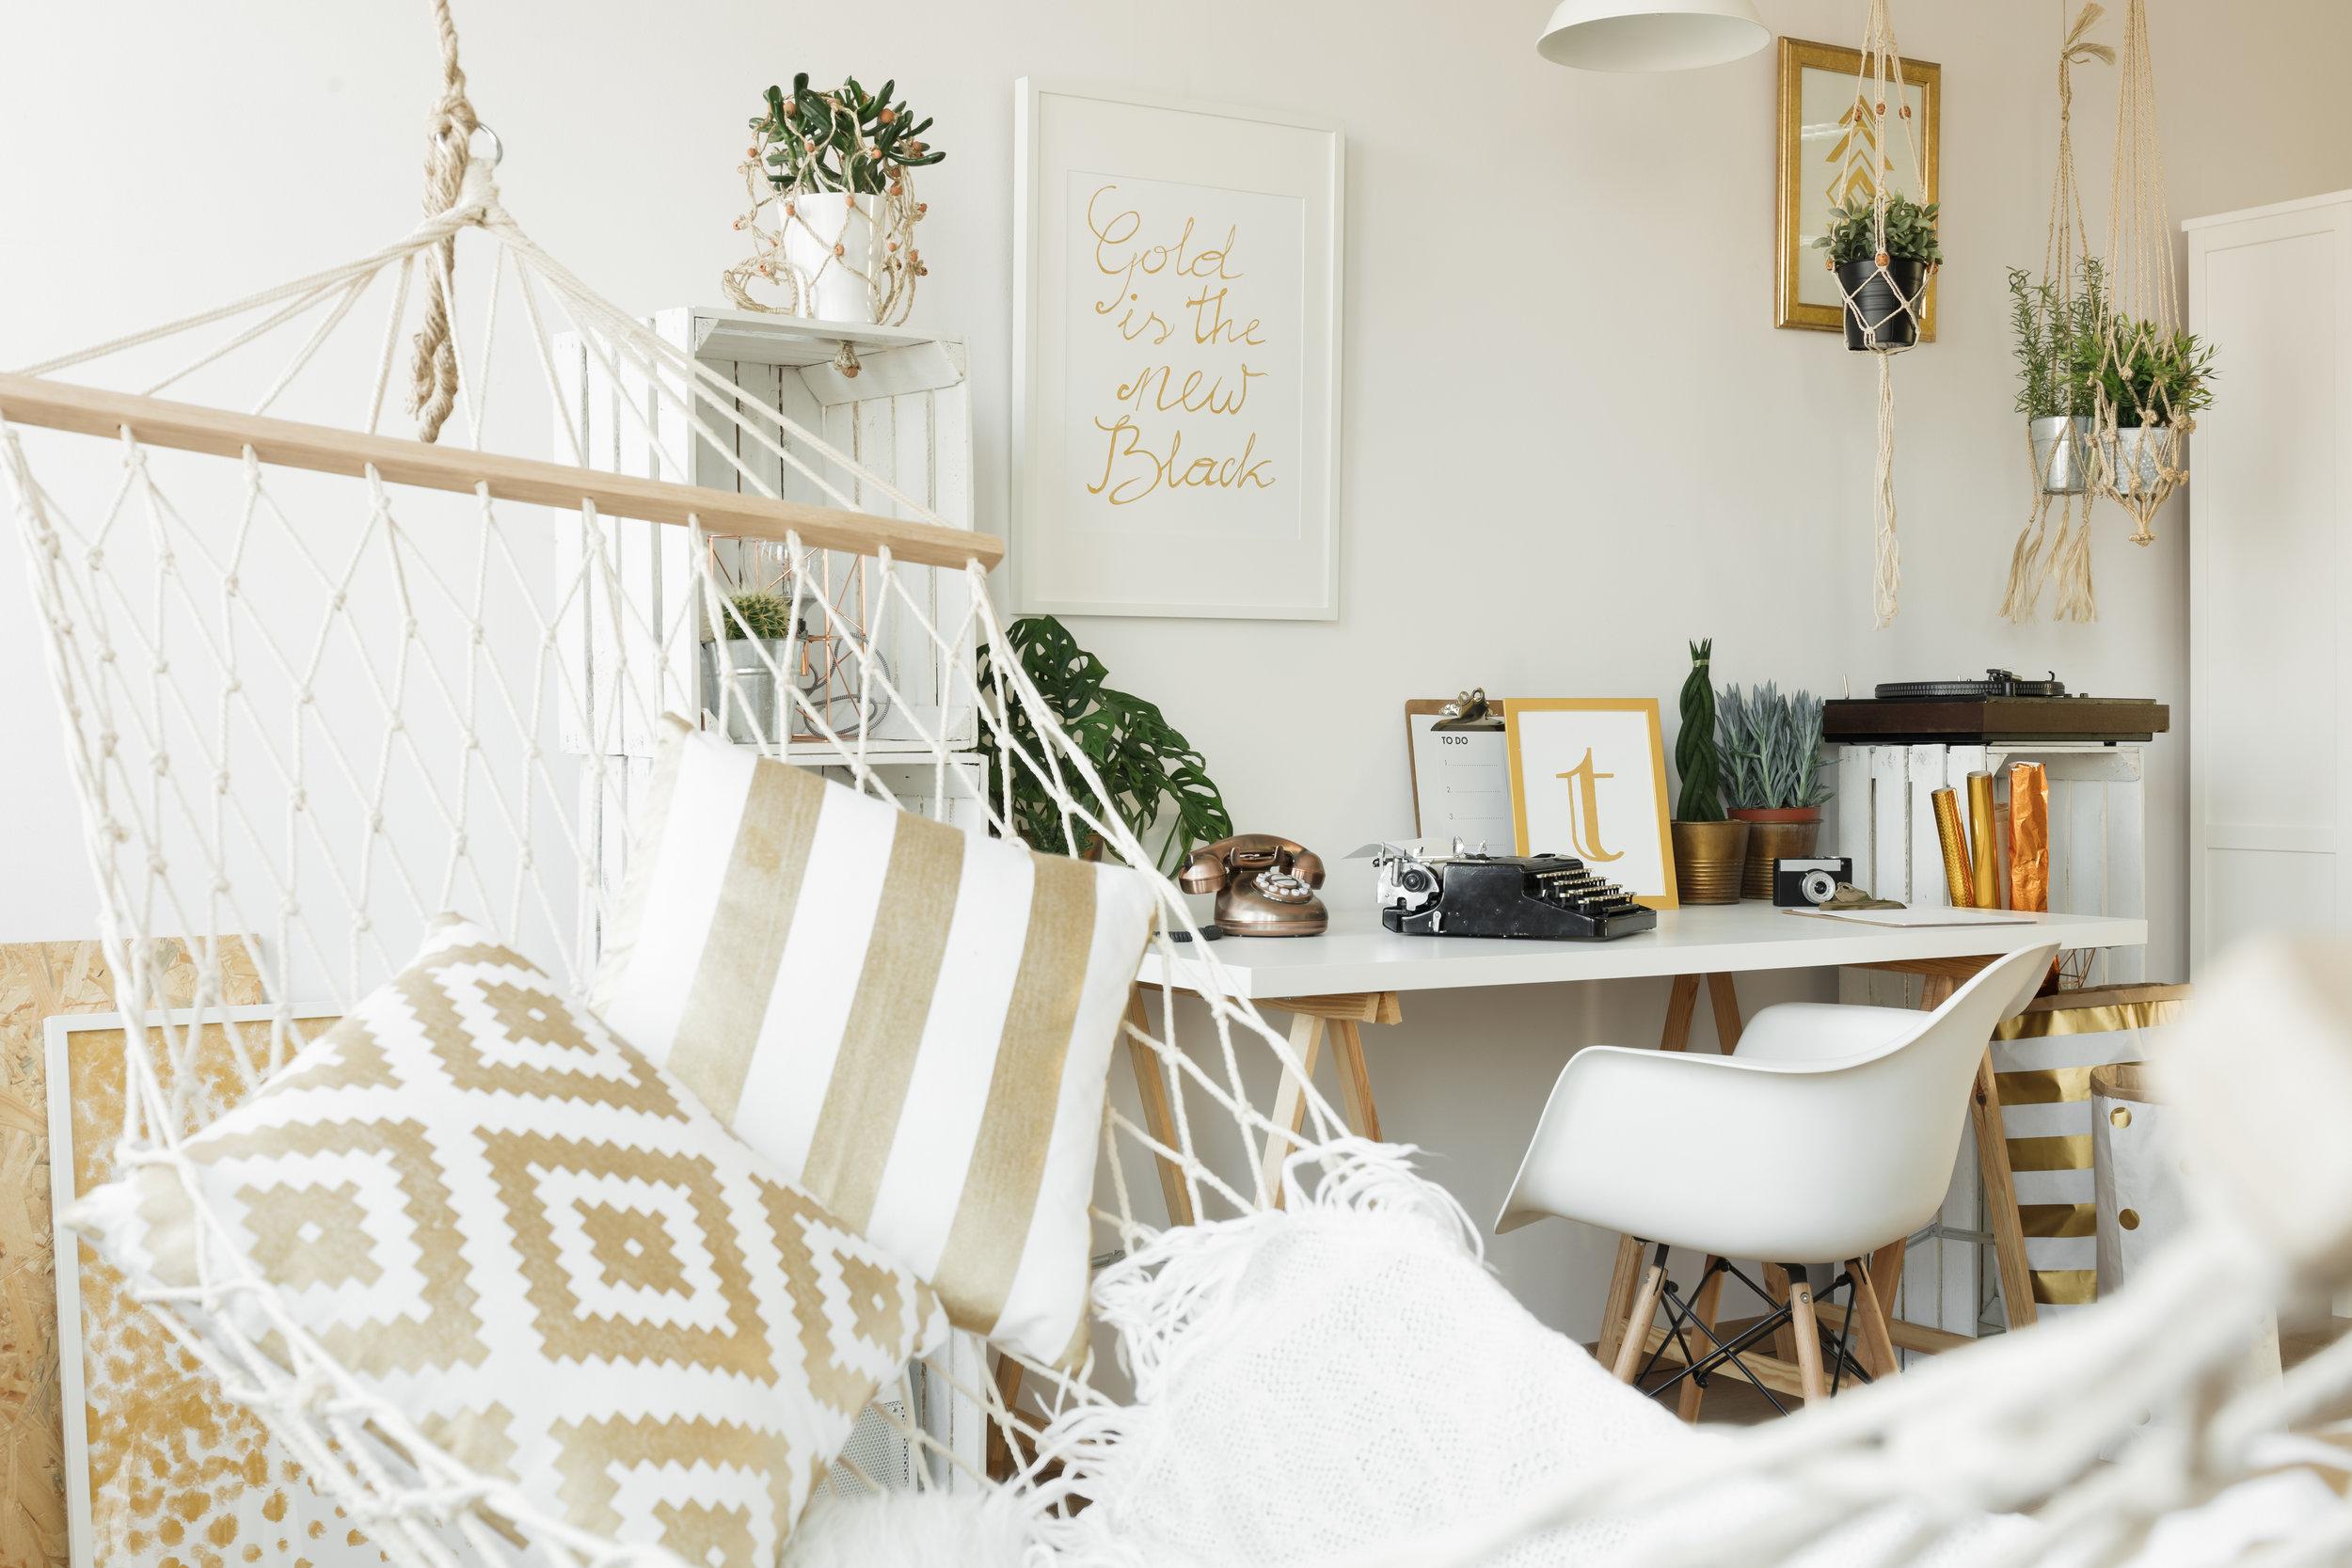 white-hammock-with-pillows-PR83MLC.JPG